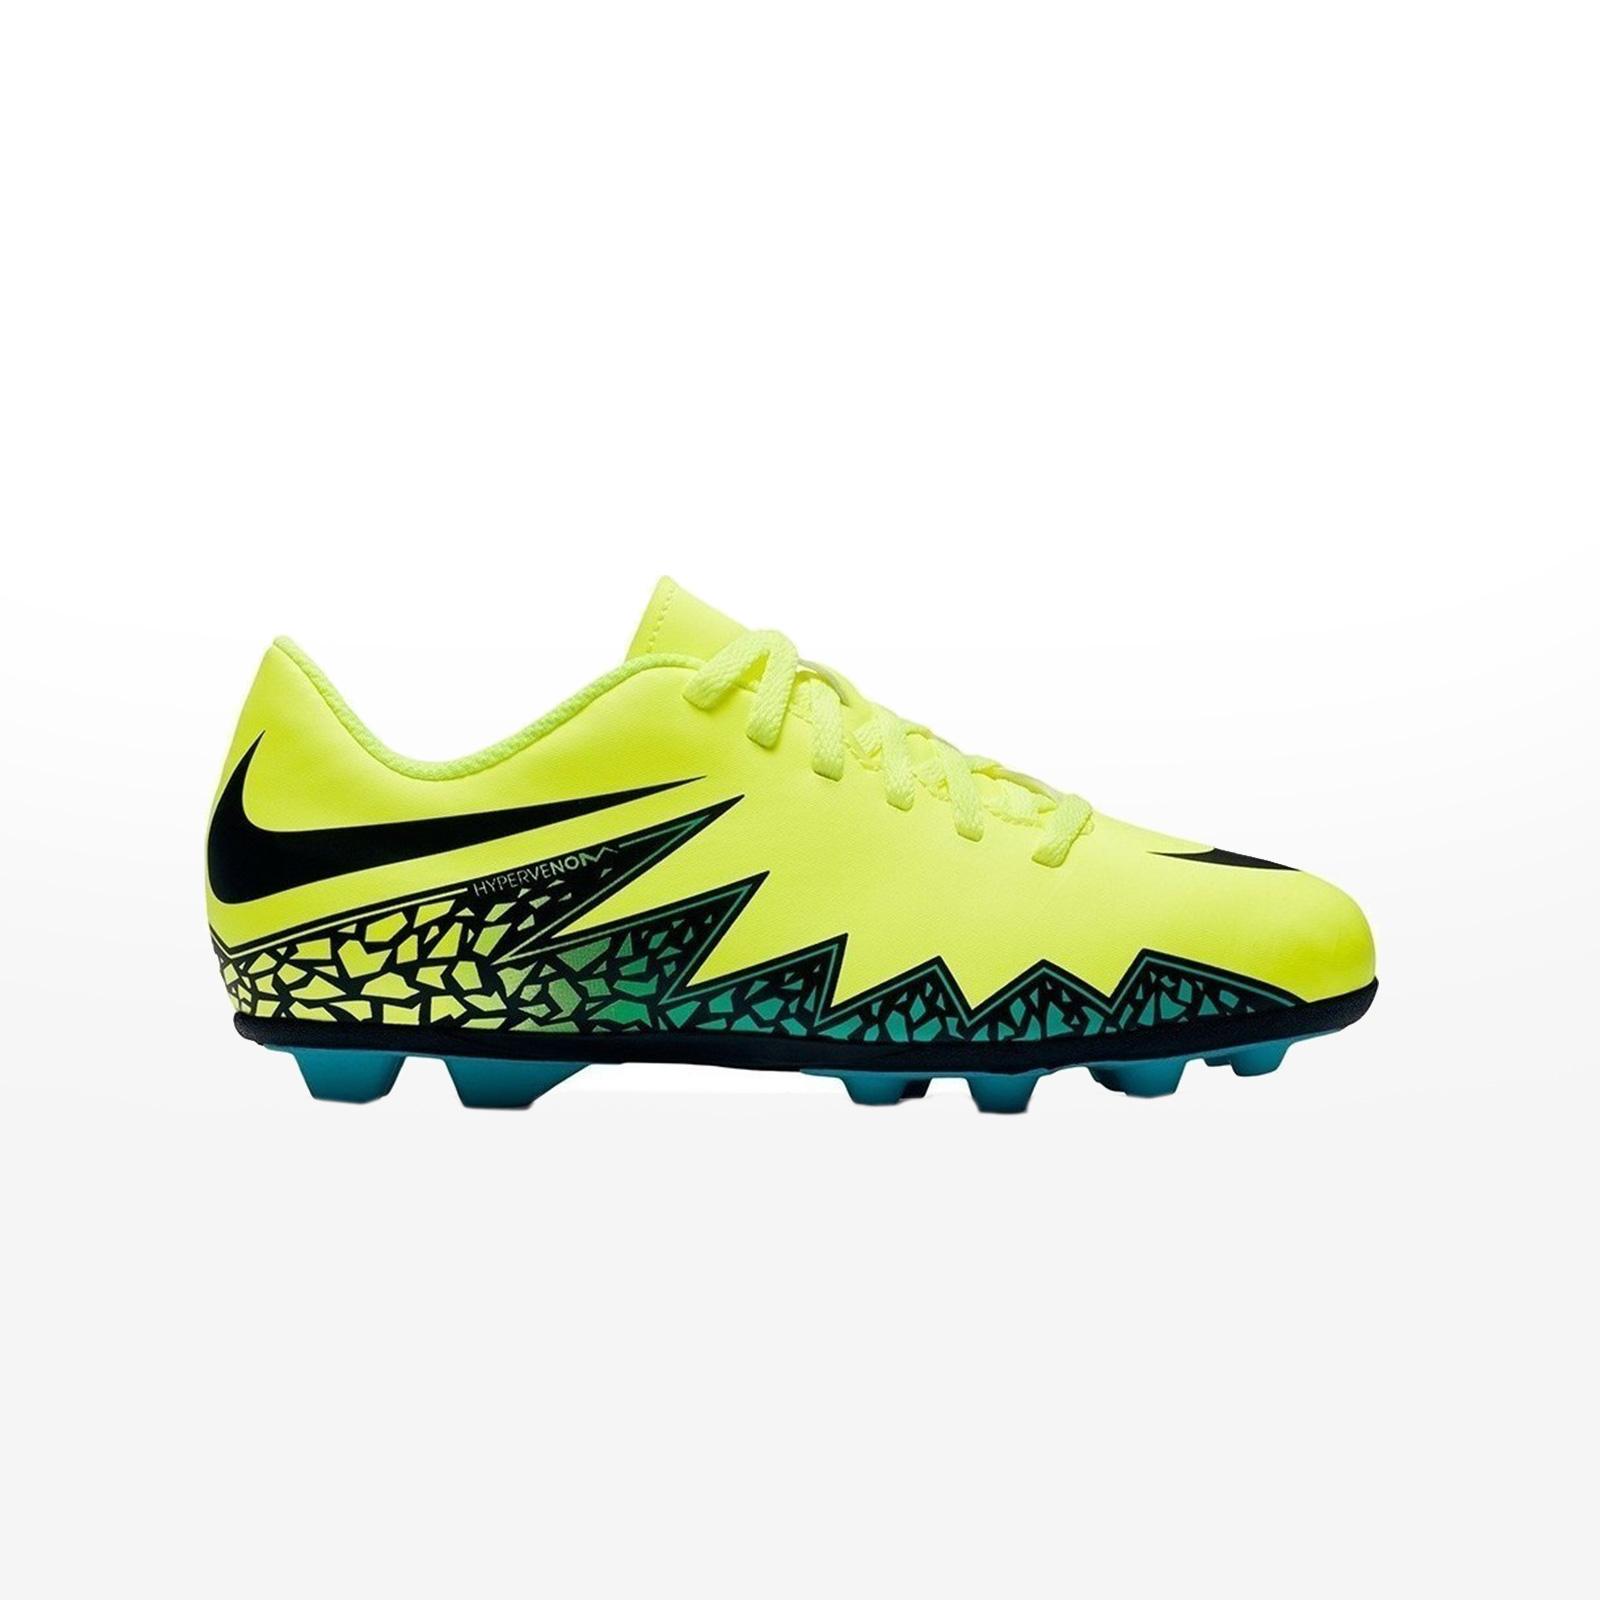 newest 52026 d1b1c -70% Sportcafe Nike – JR HYPERVENOM PHADE II FG-R – VOLT BLACK-HYPER